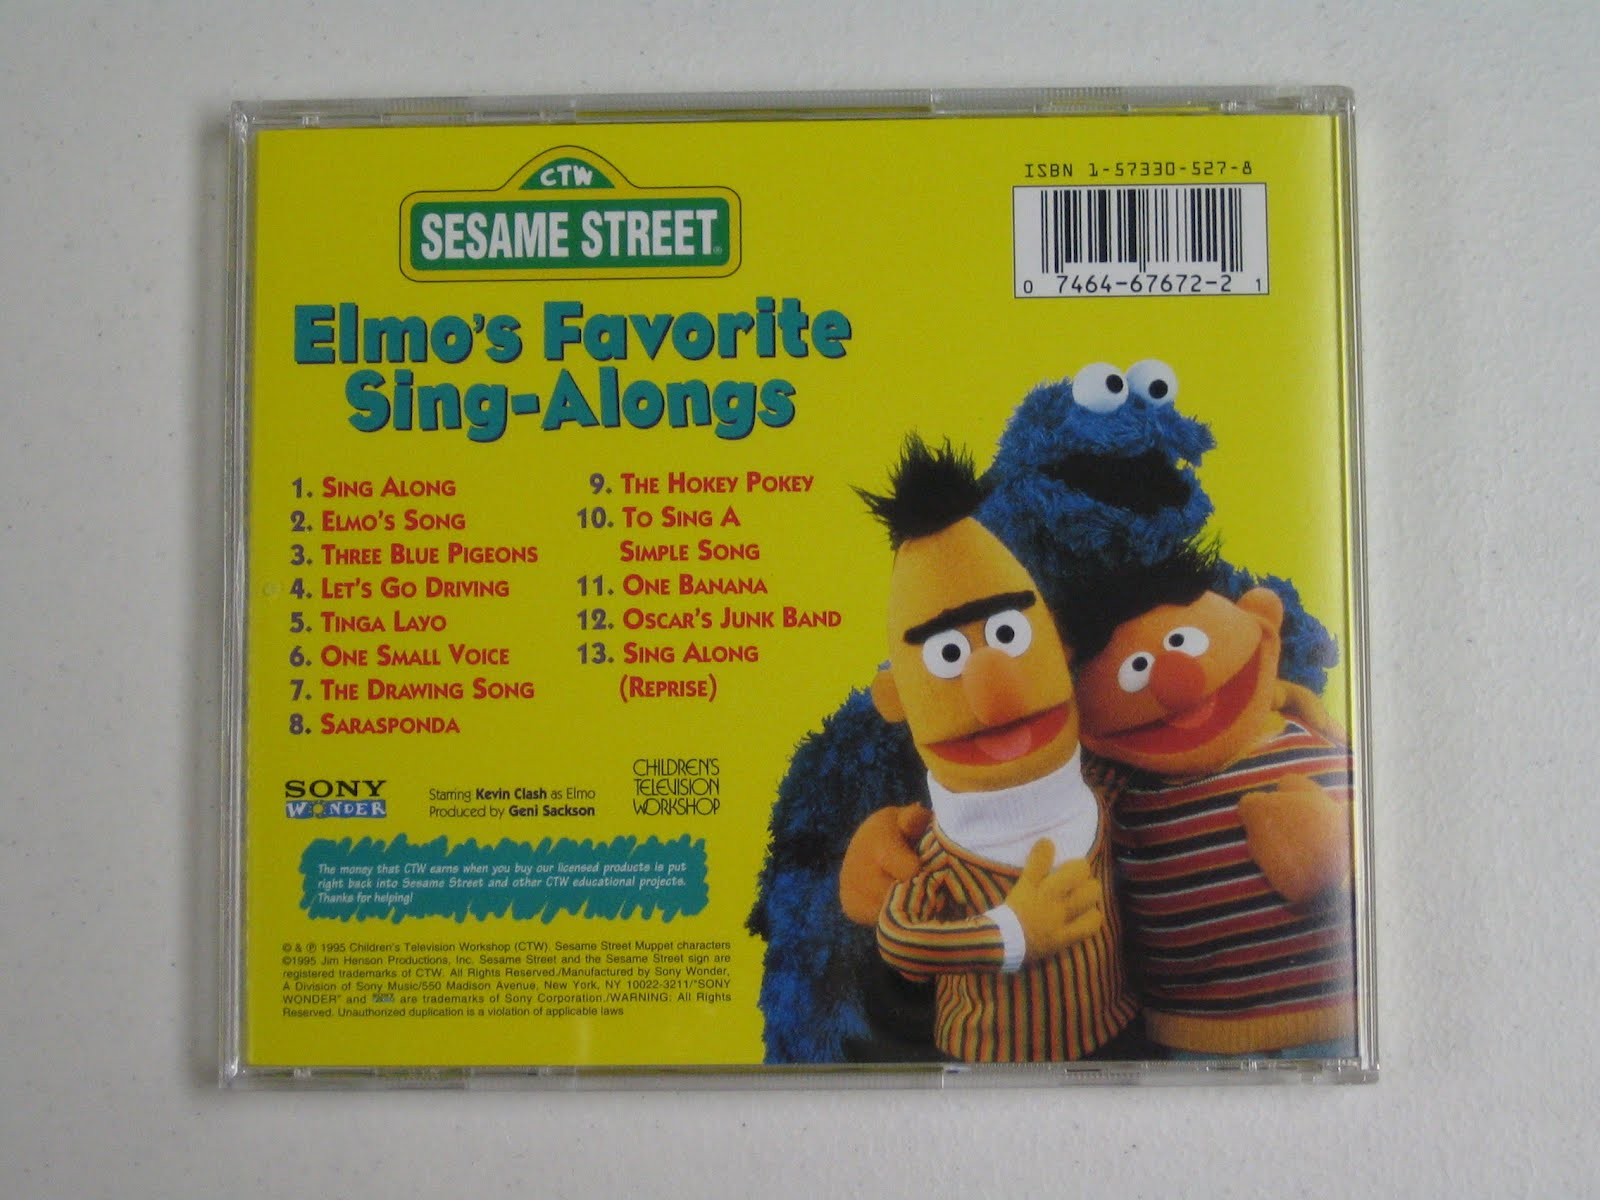 Sesame street songs cd - Shii store